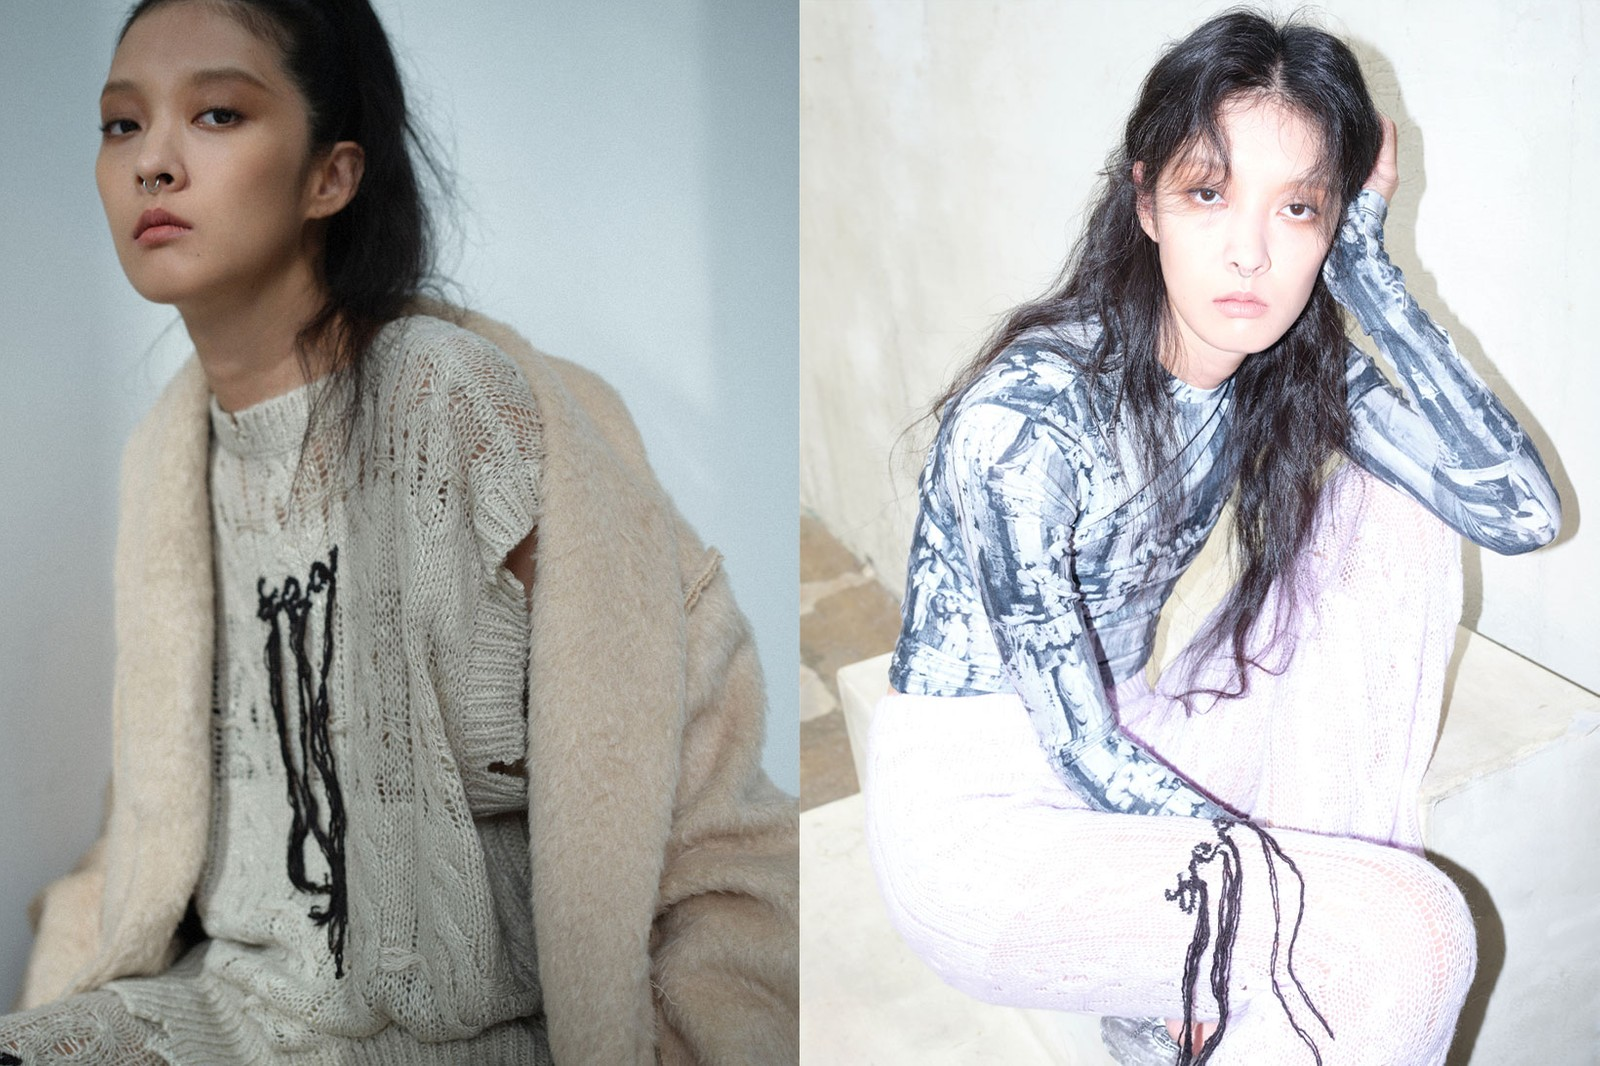 korean fashion emerging female fashion designers brands seo seoul kang so young knitwear